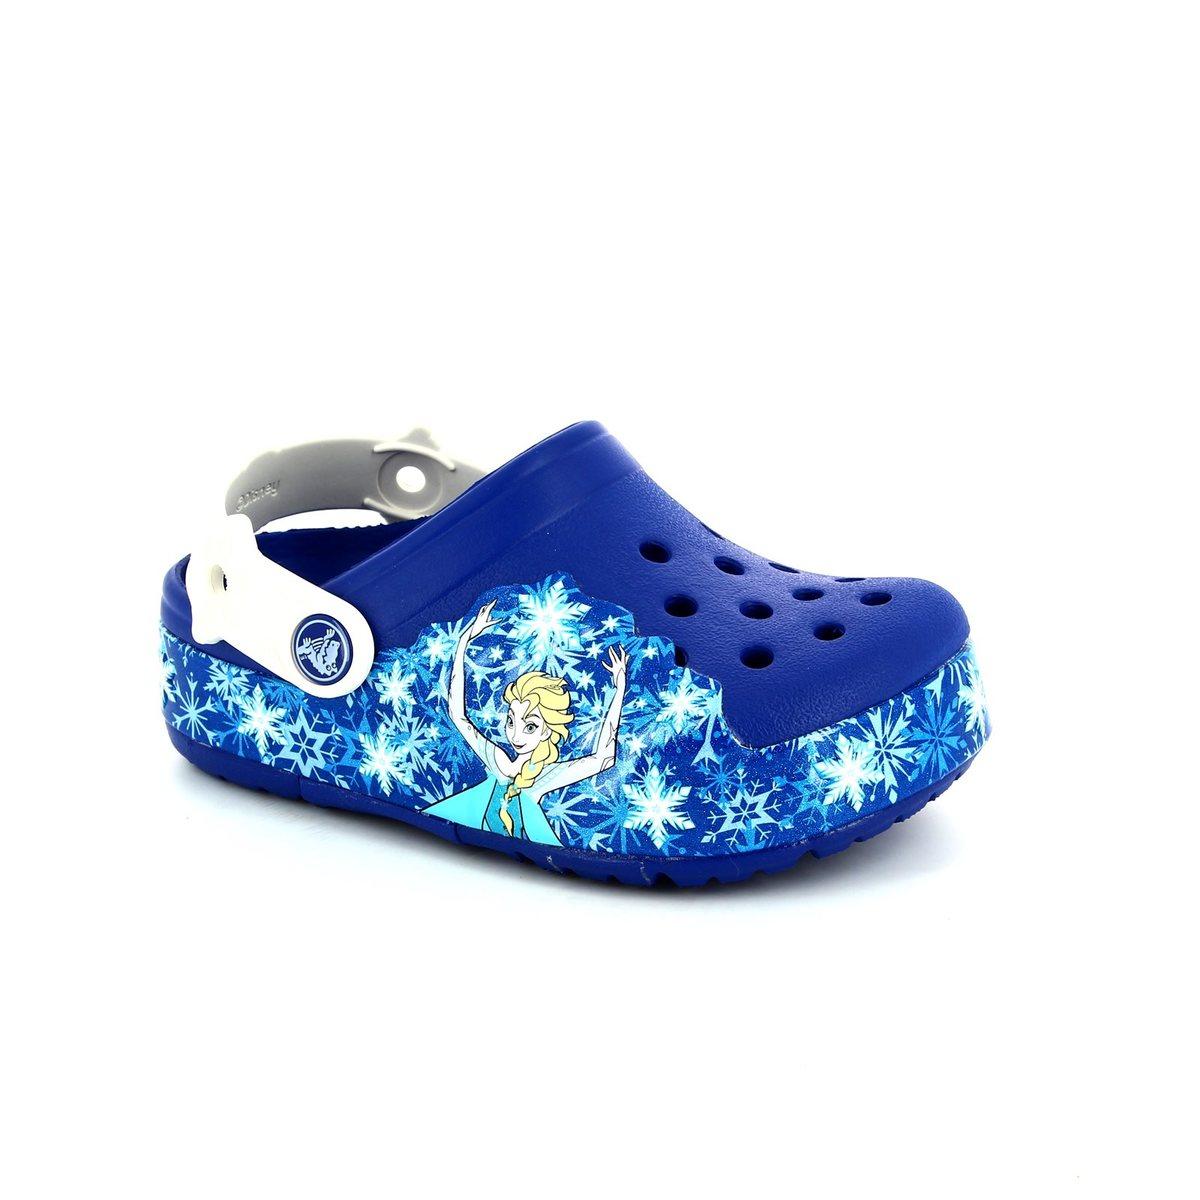 e9f36f34f1ffa7 Crocs Summer Shoes - Blue multi - 202357 4BE FROZEN LIGHTS